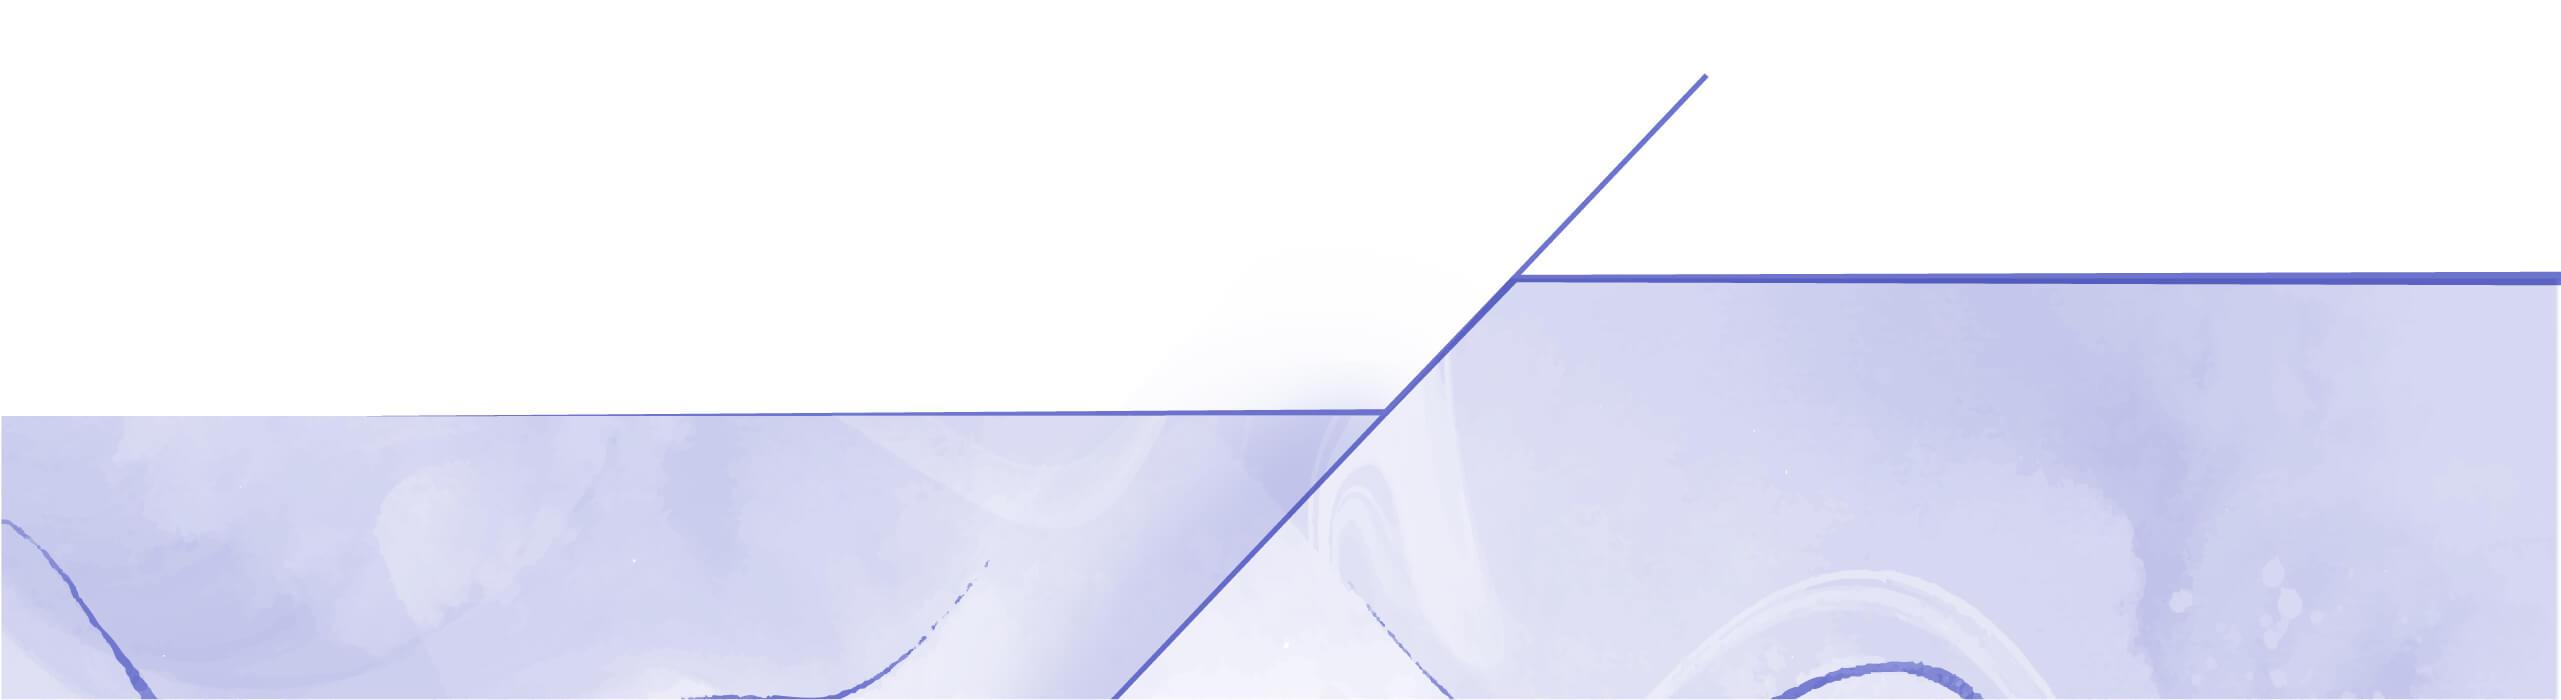 patchwork promotion blue forms